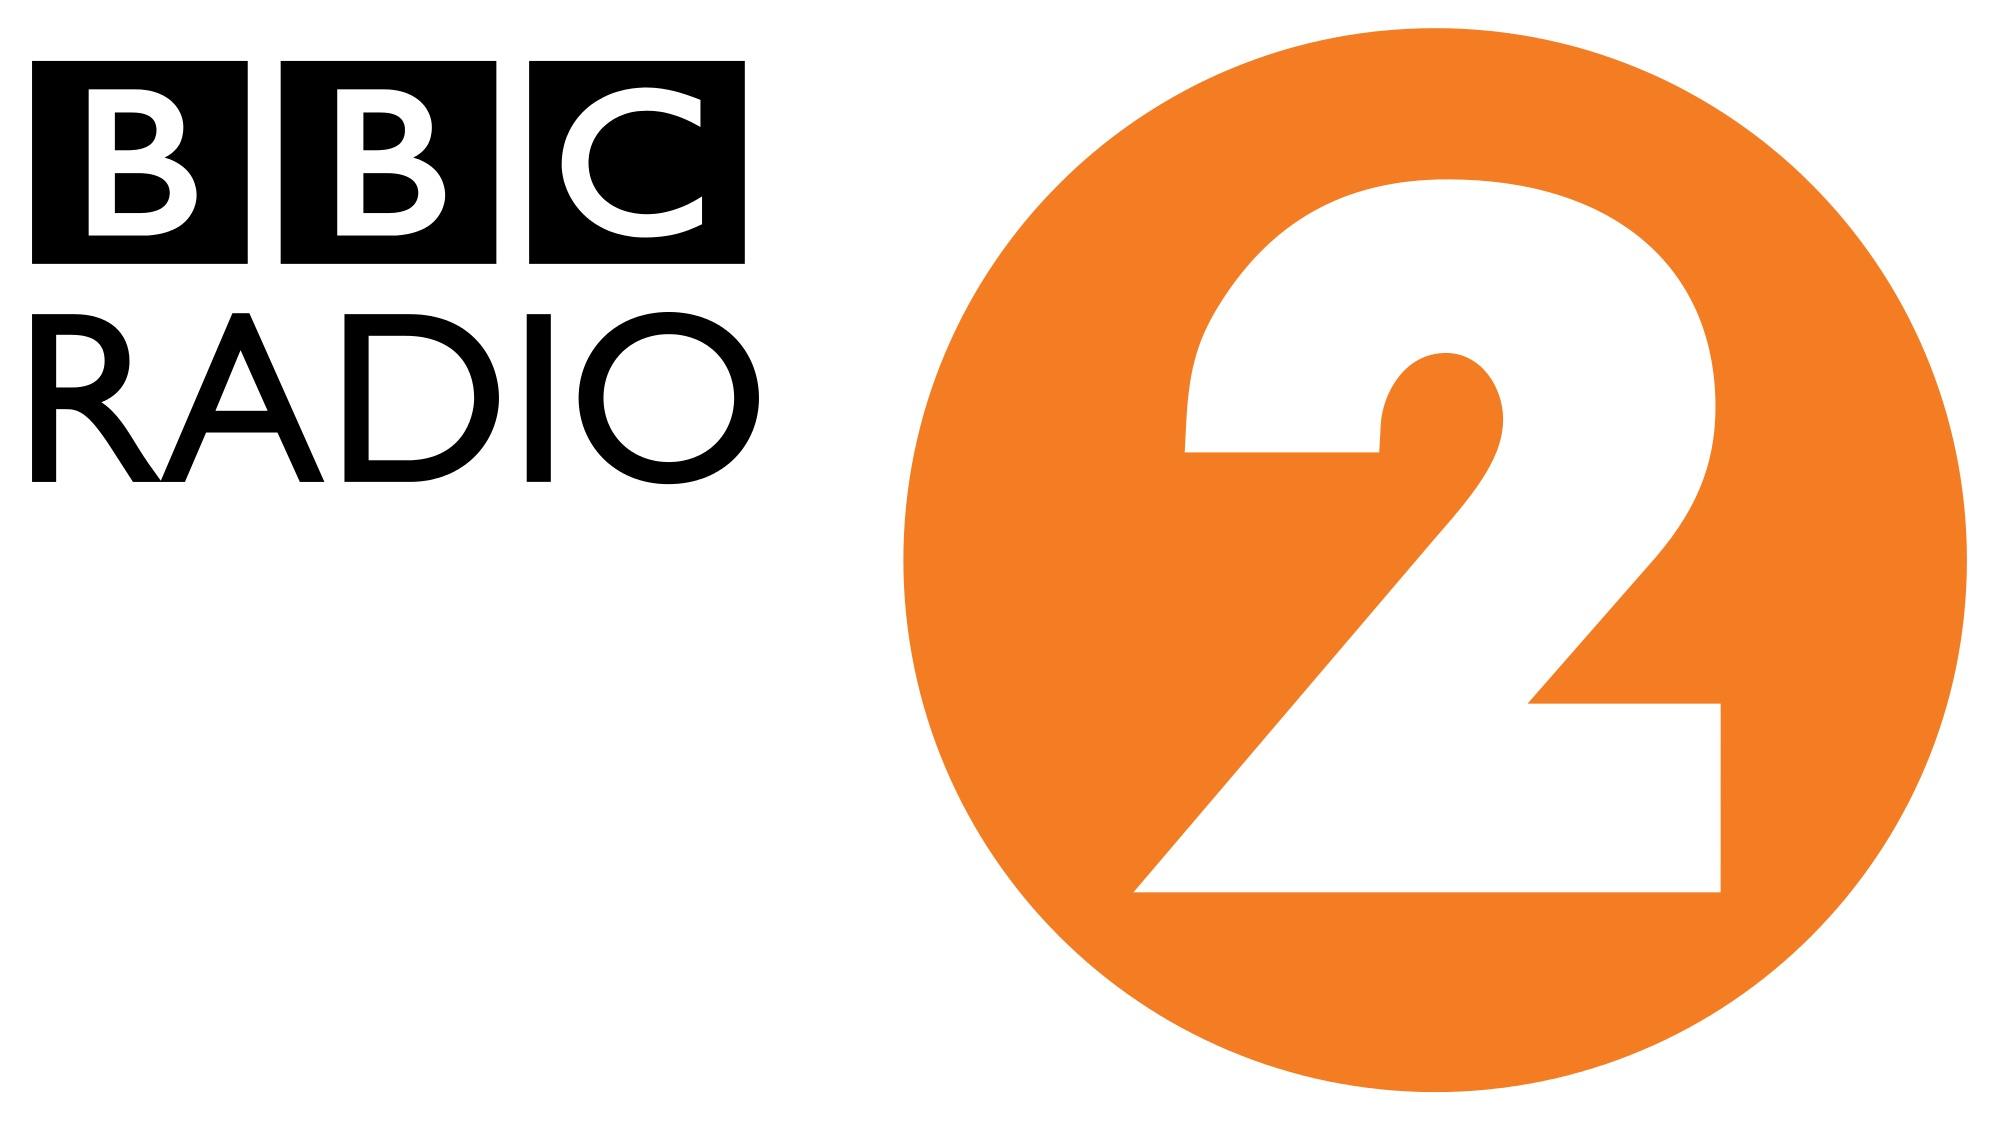 BBC Radio 2 Interview: Simon Mayo Show (June 2017)